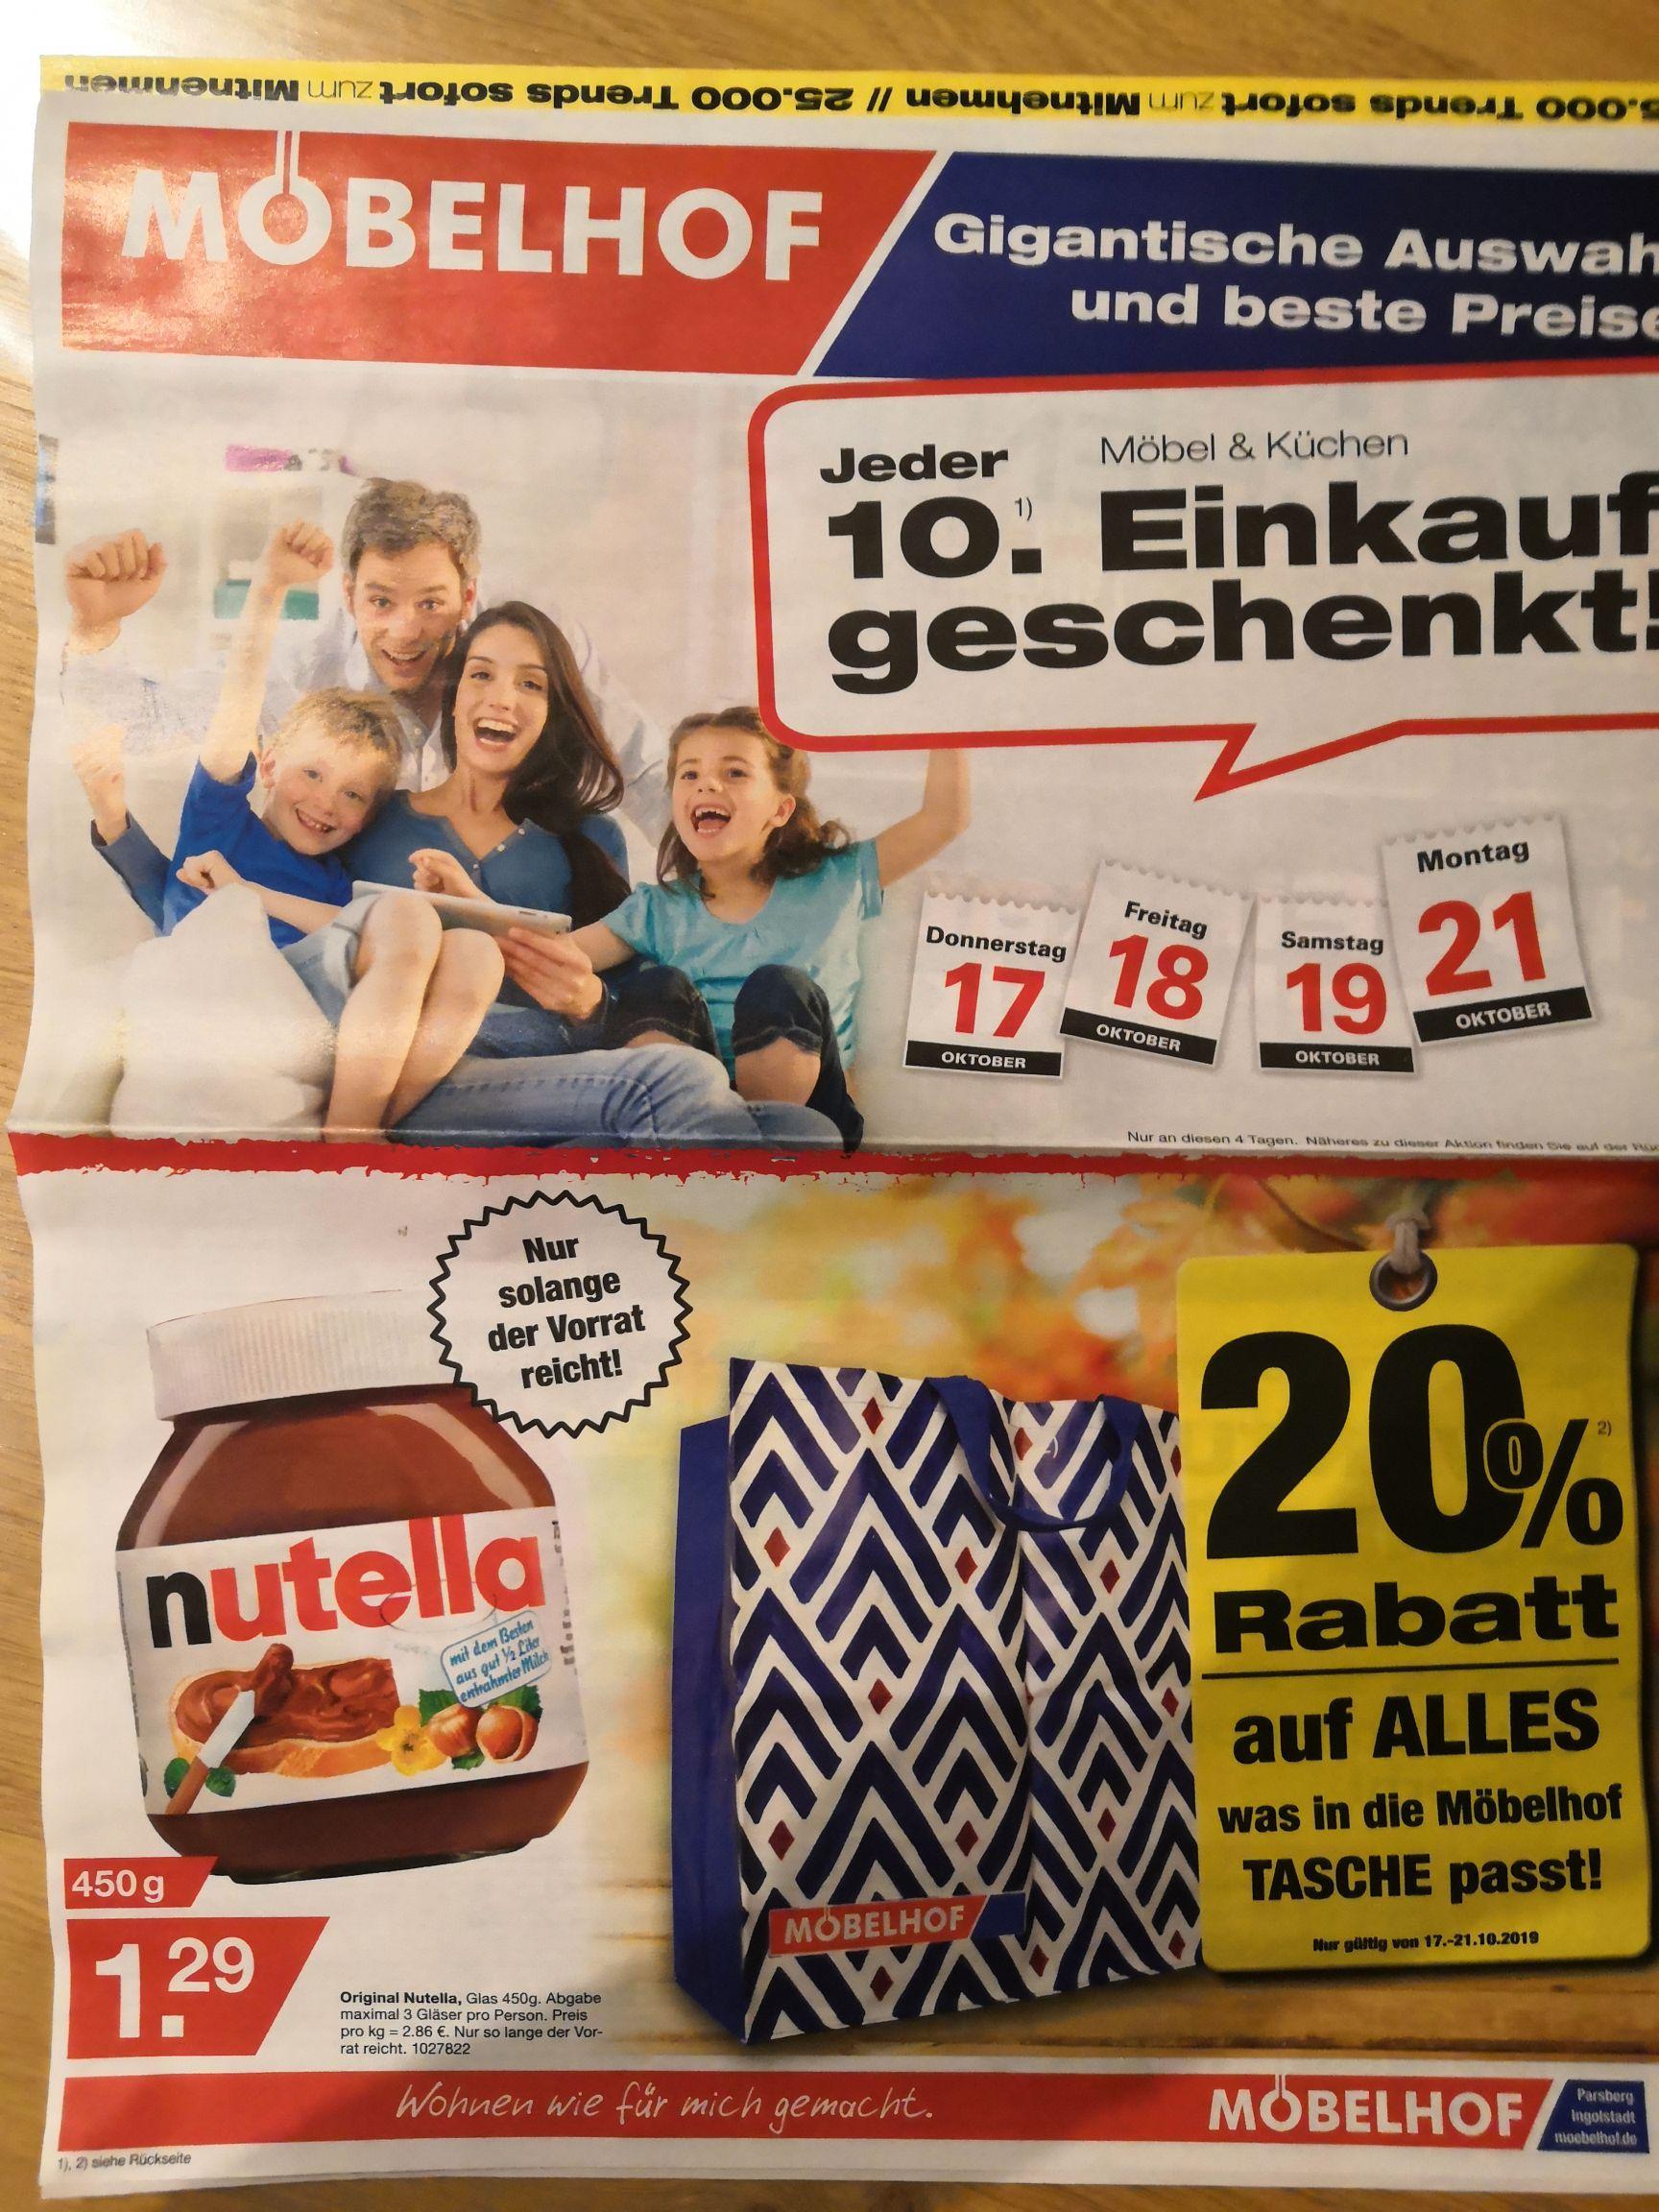 Original Nutella 450g Ingolstadt Parsberg